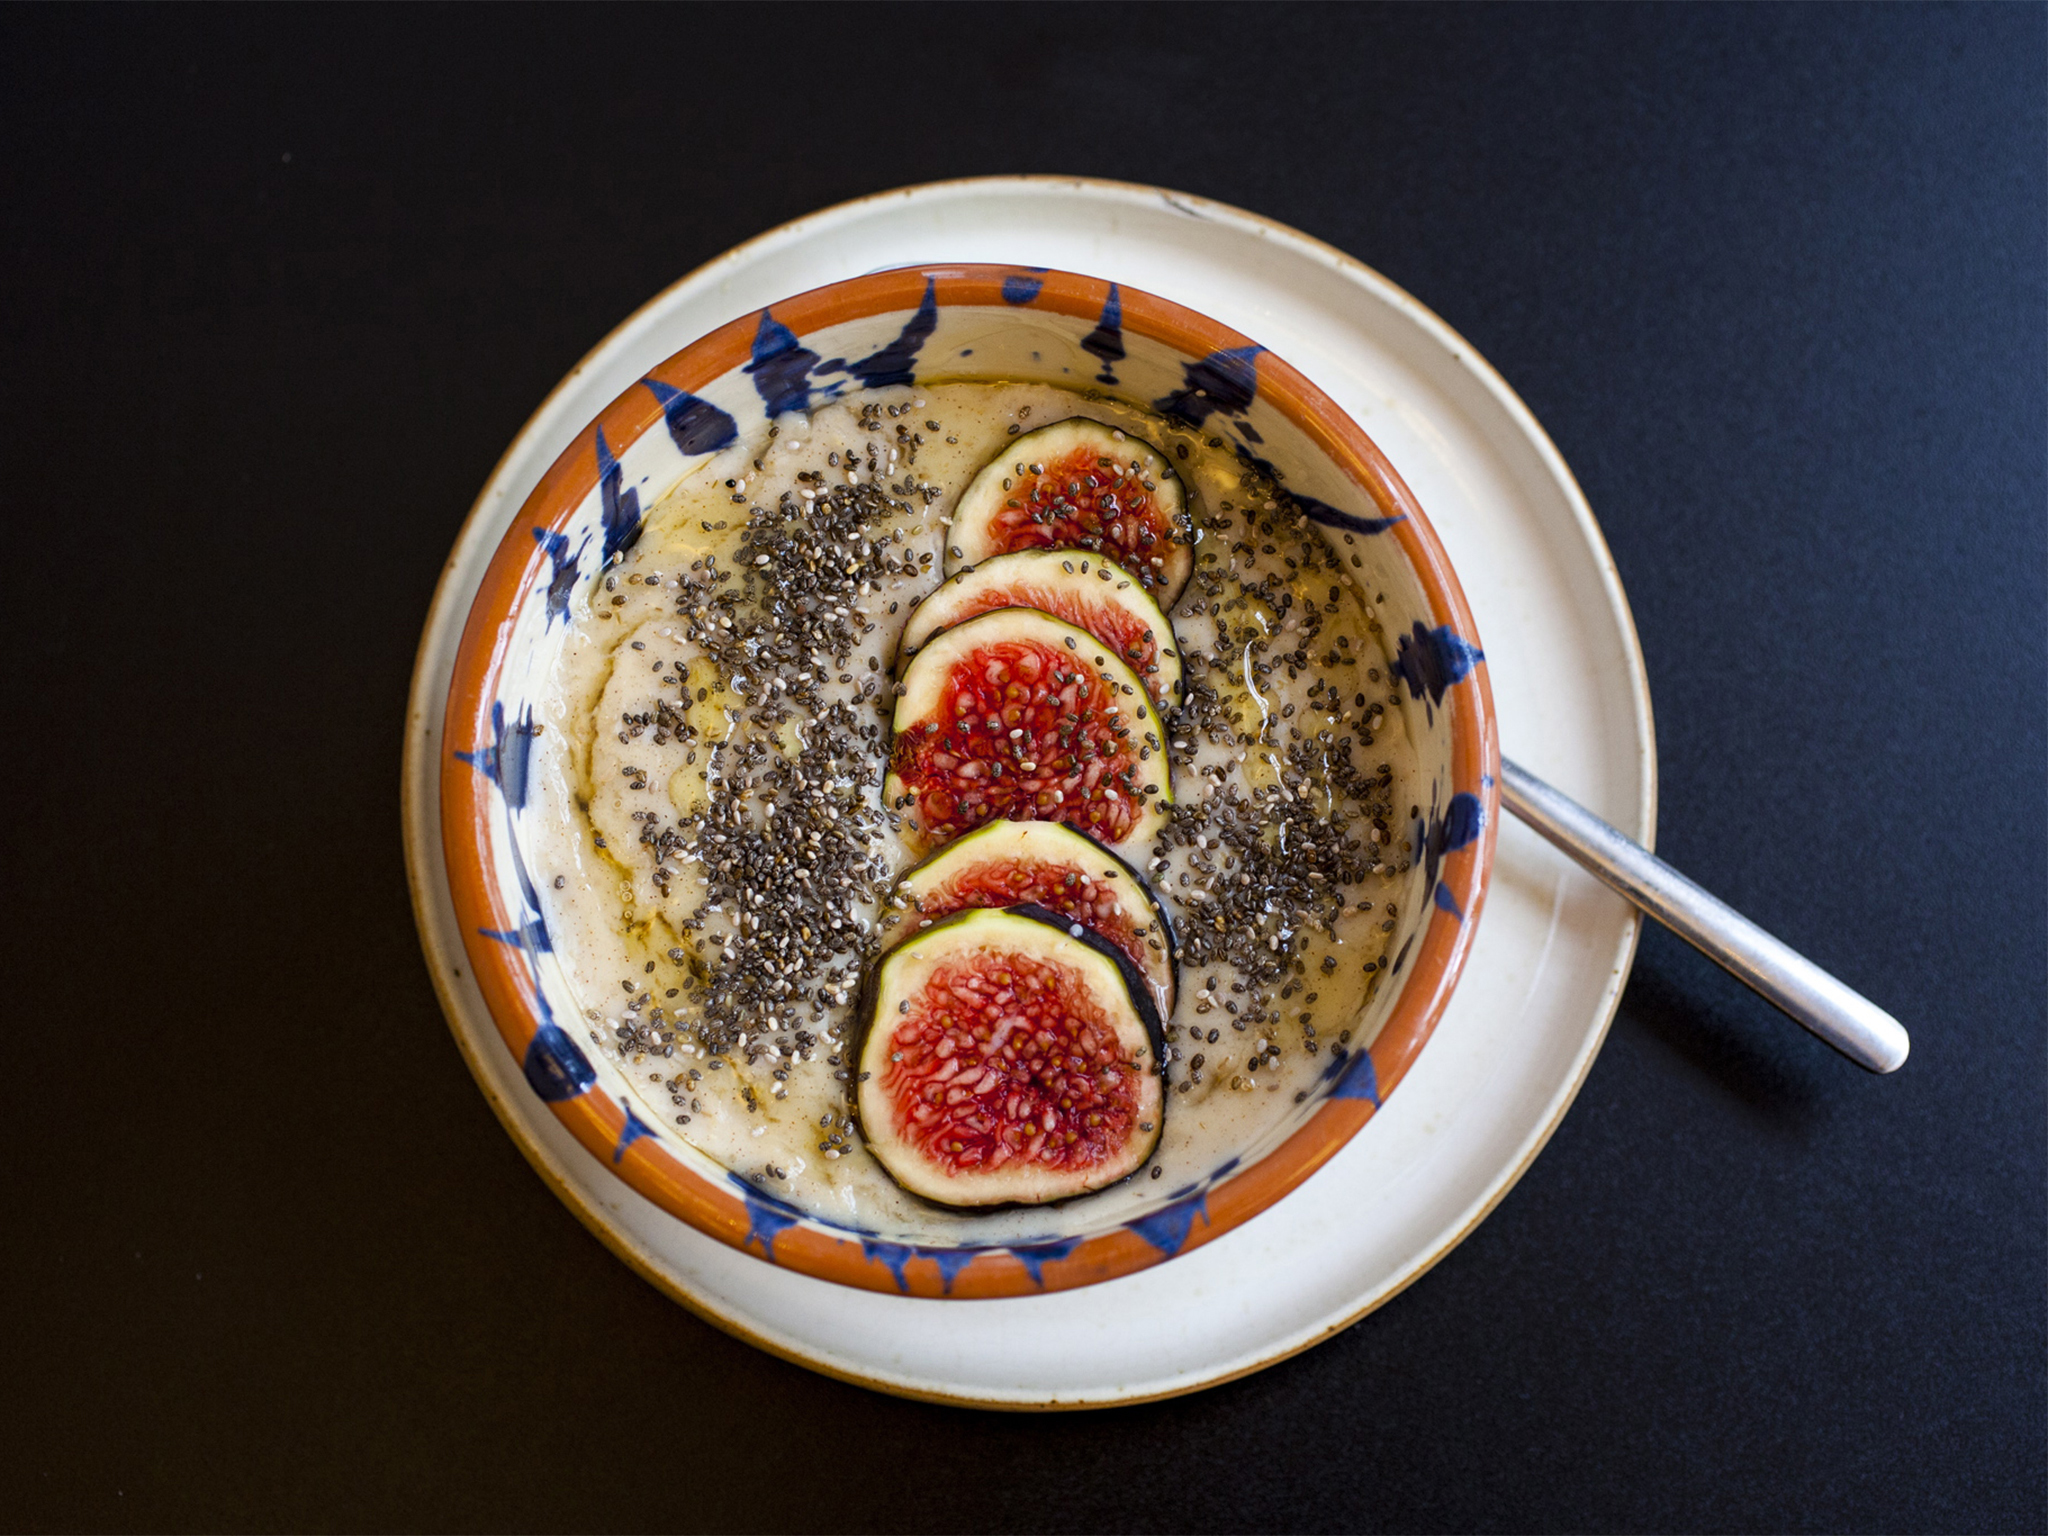 London's best porridge